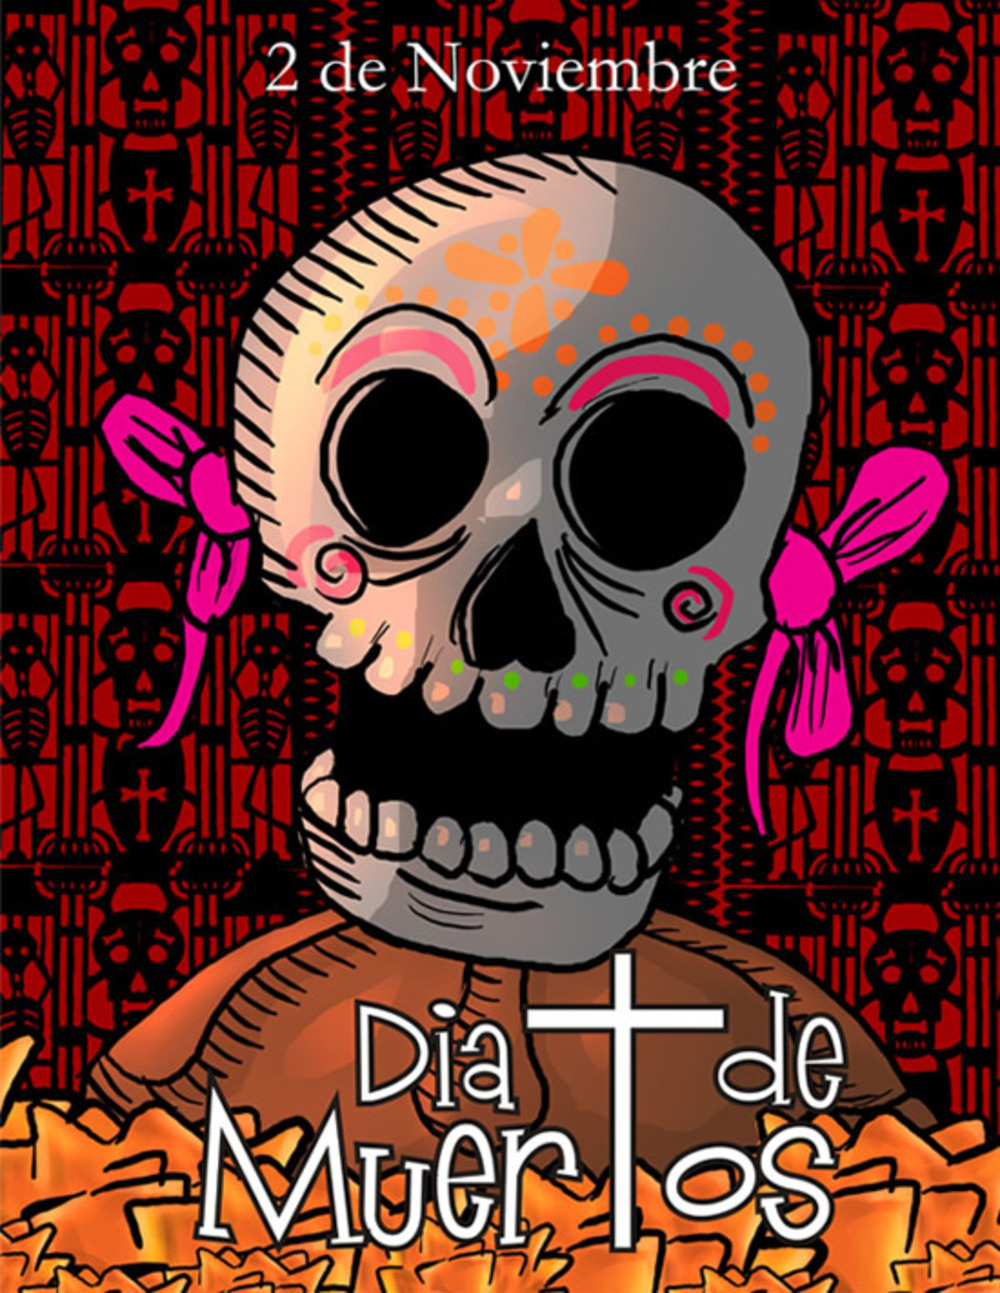 2 Noviembre Dia de Muertos